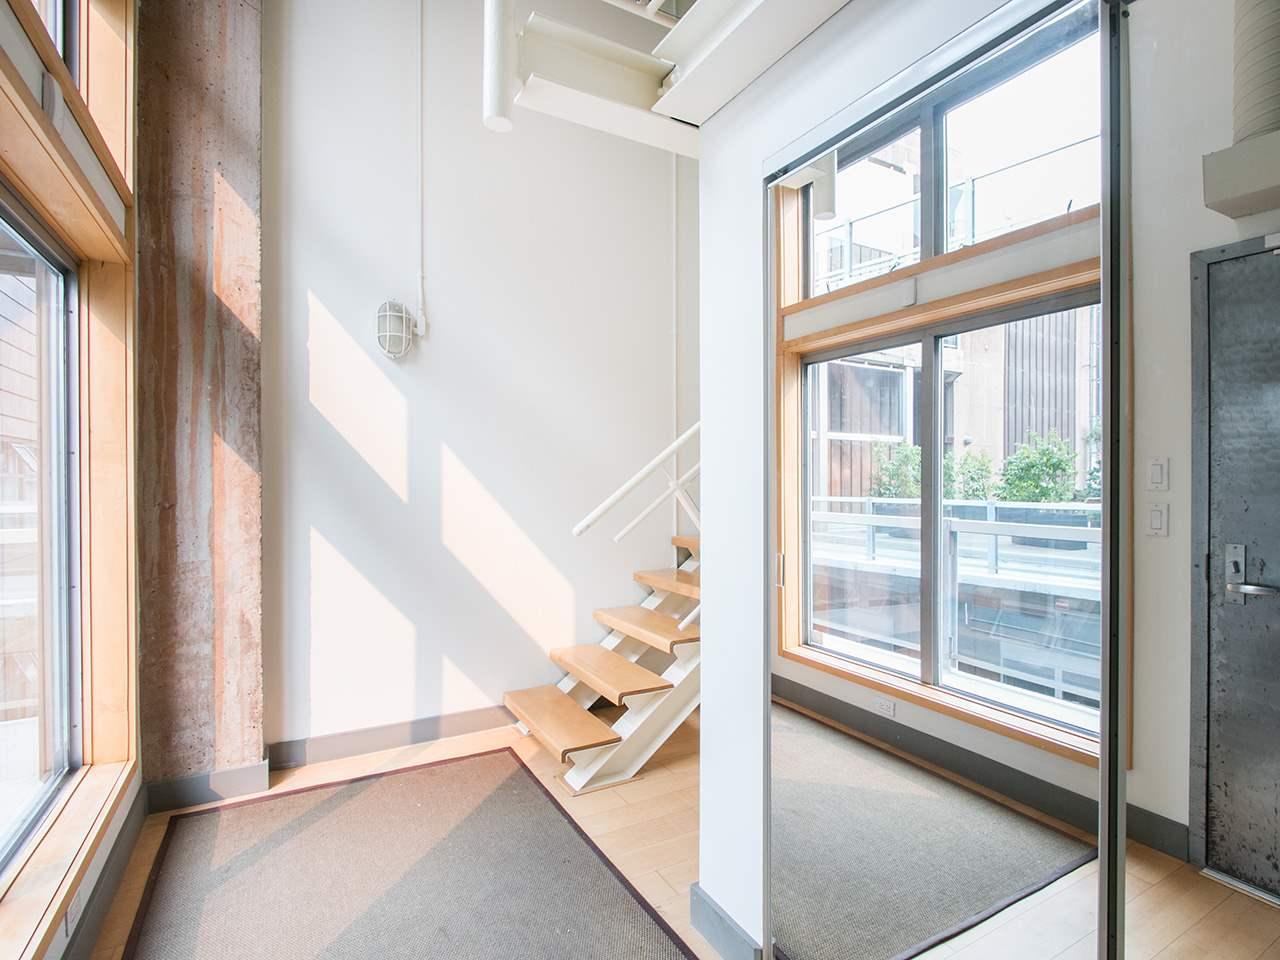 Condo Apartment at 403 1529 W 6TH AVENUE, Unit 403, Vancouver West, British Columbia. Image 11